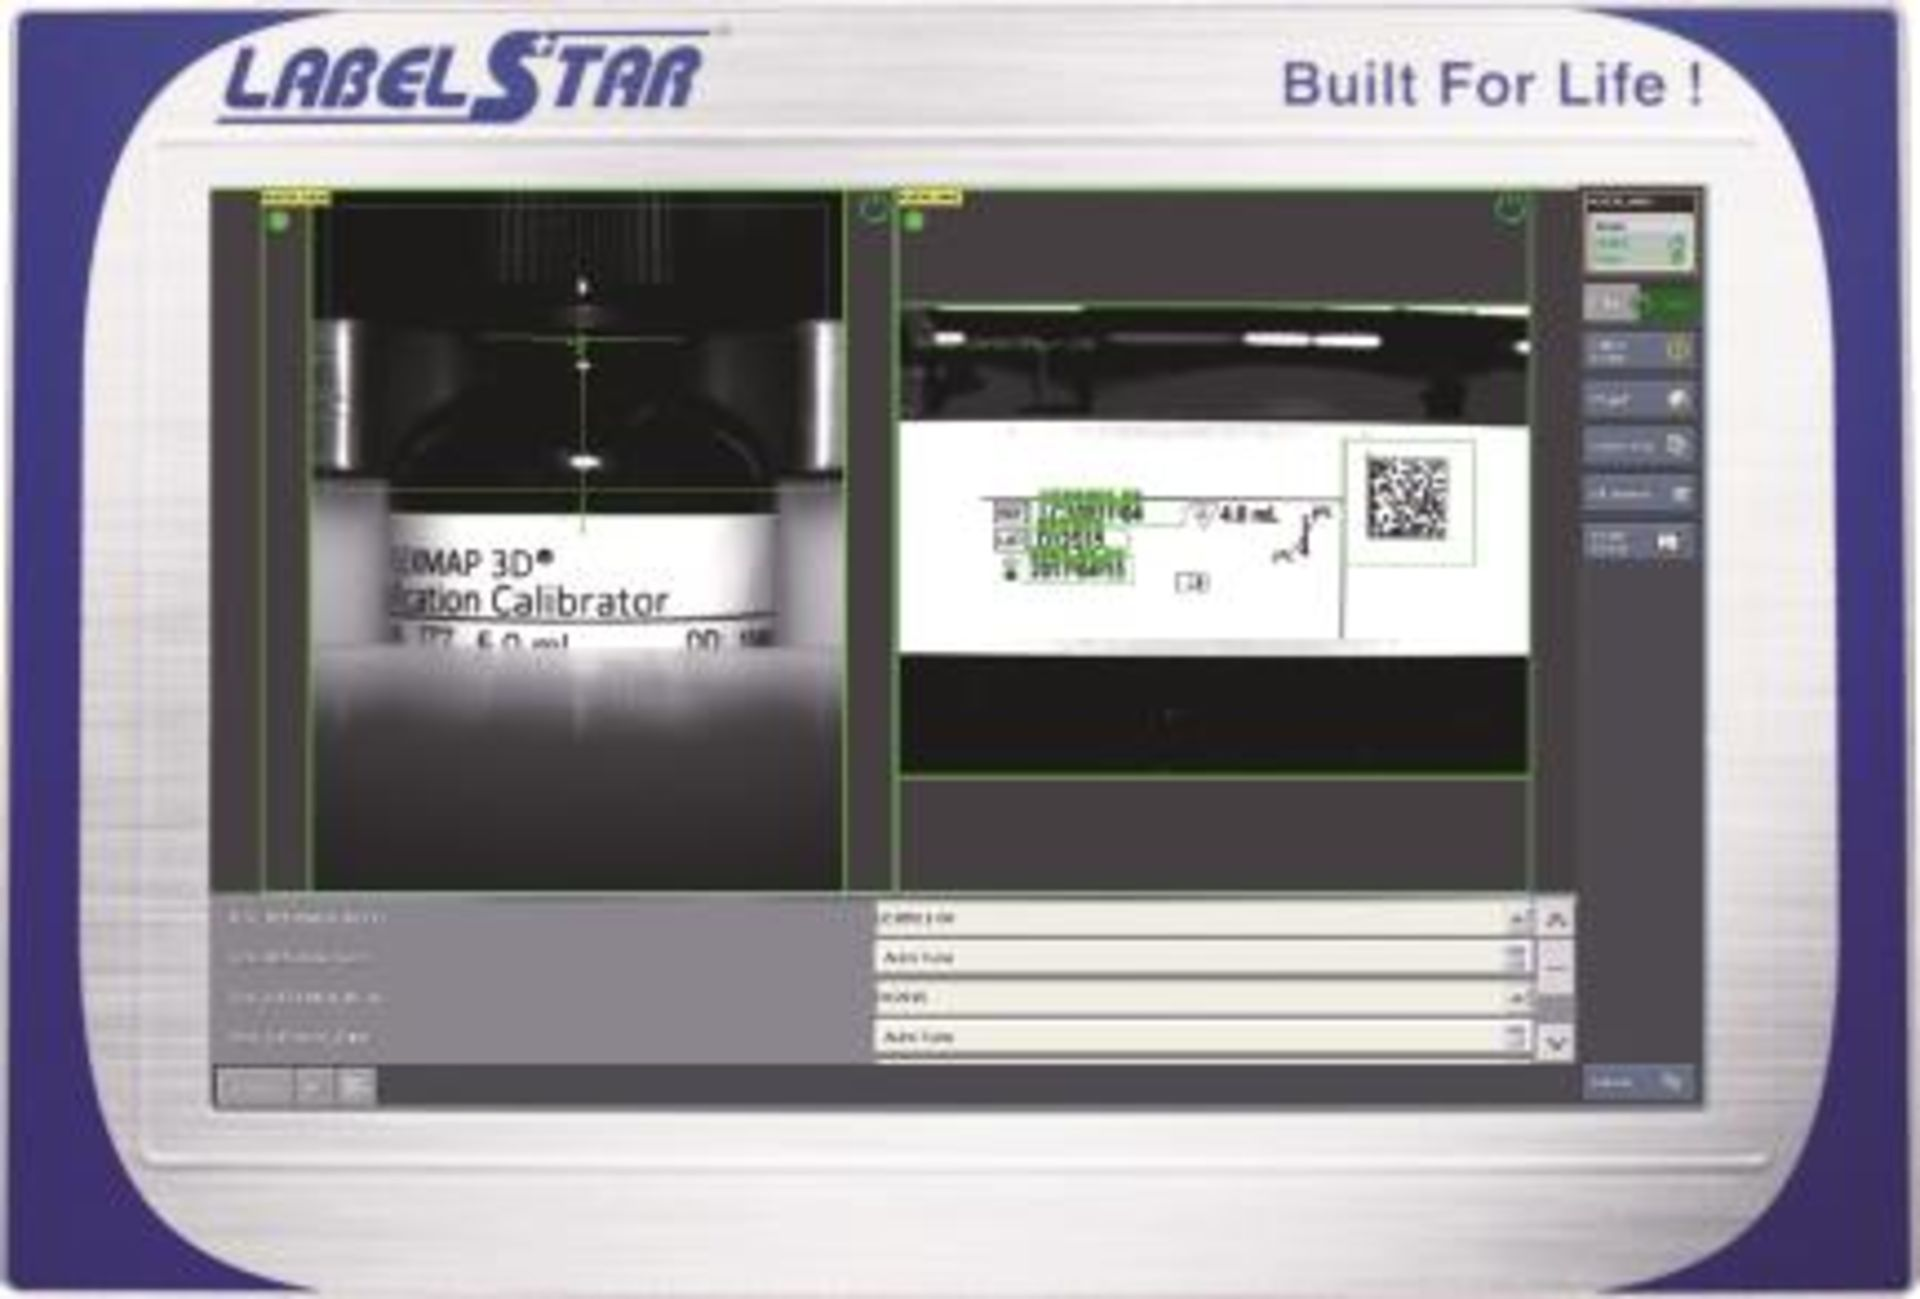 Lot 1 - CAPMATIC Monobloc Synergy Patriot Model FCL - Unused